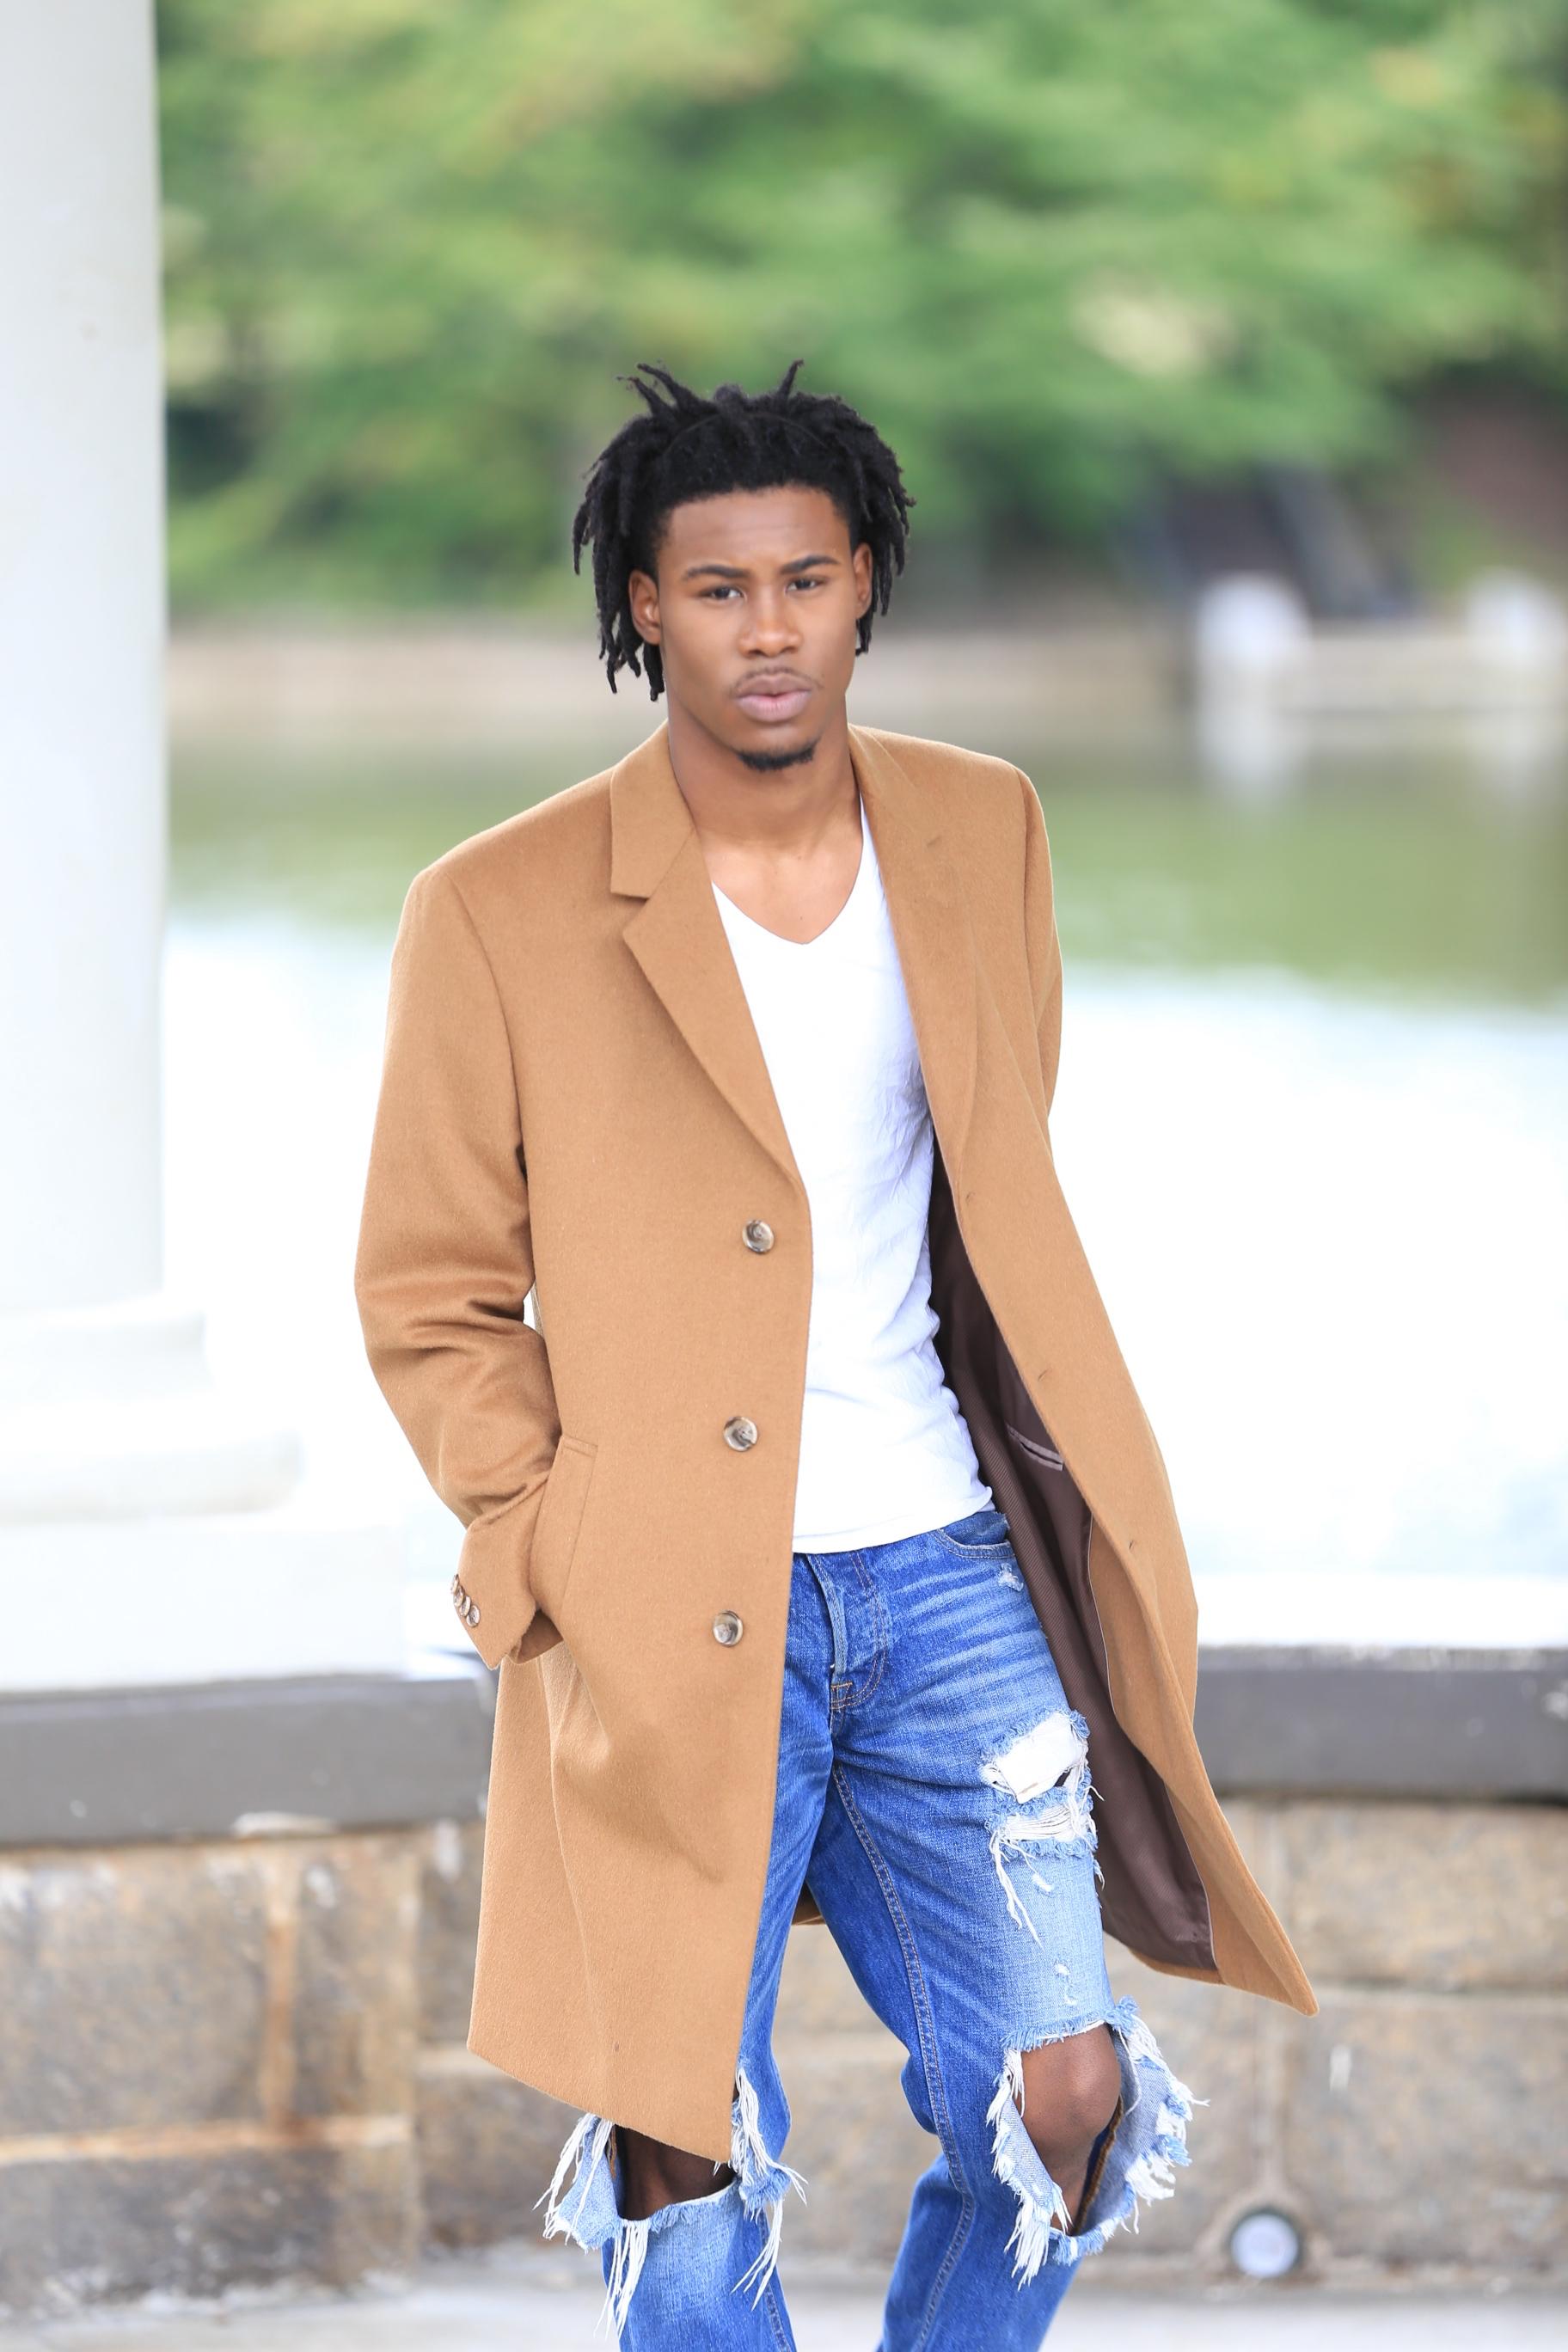 Limitless Male Model - Omarious Fann